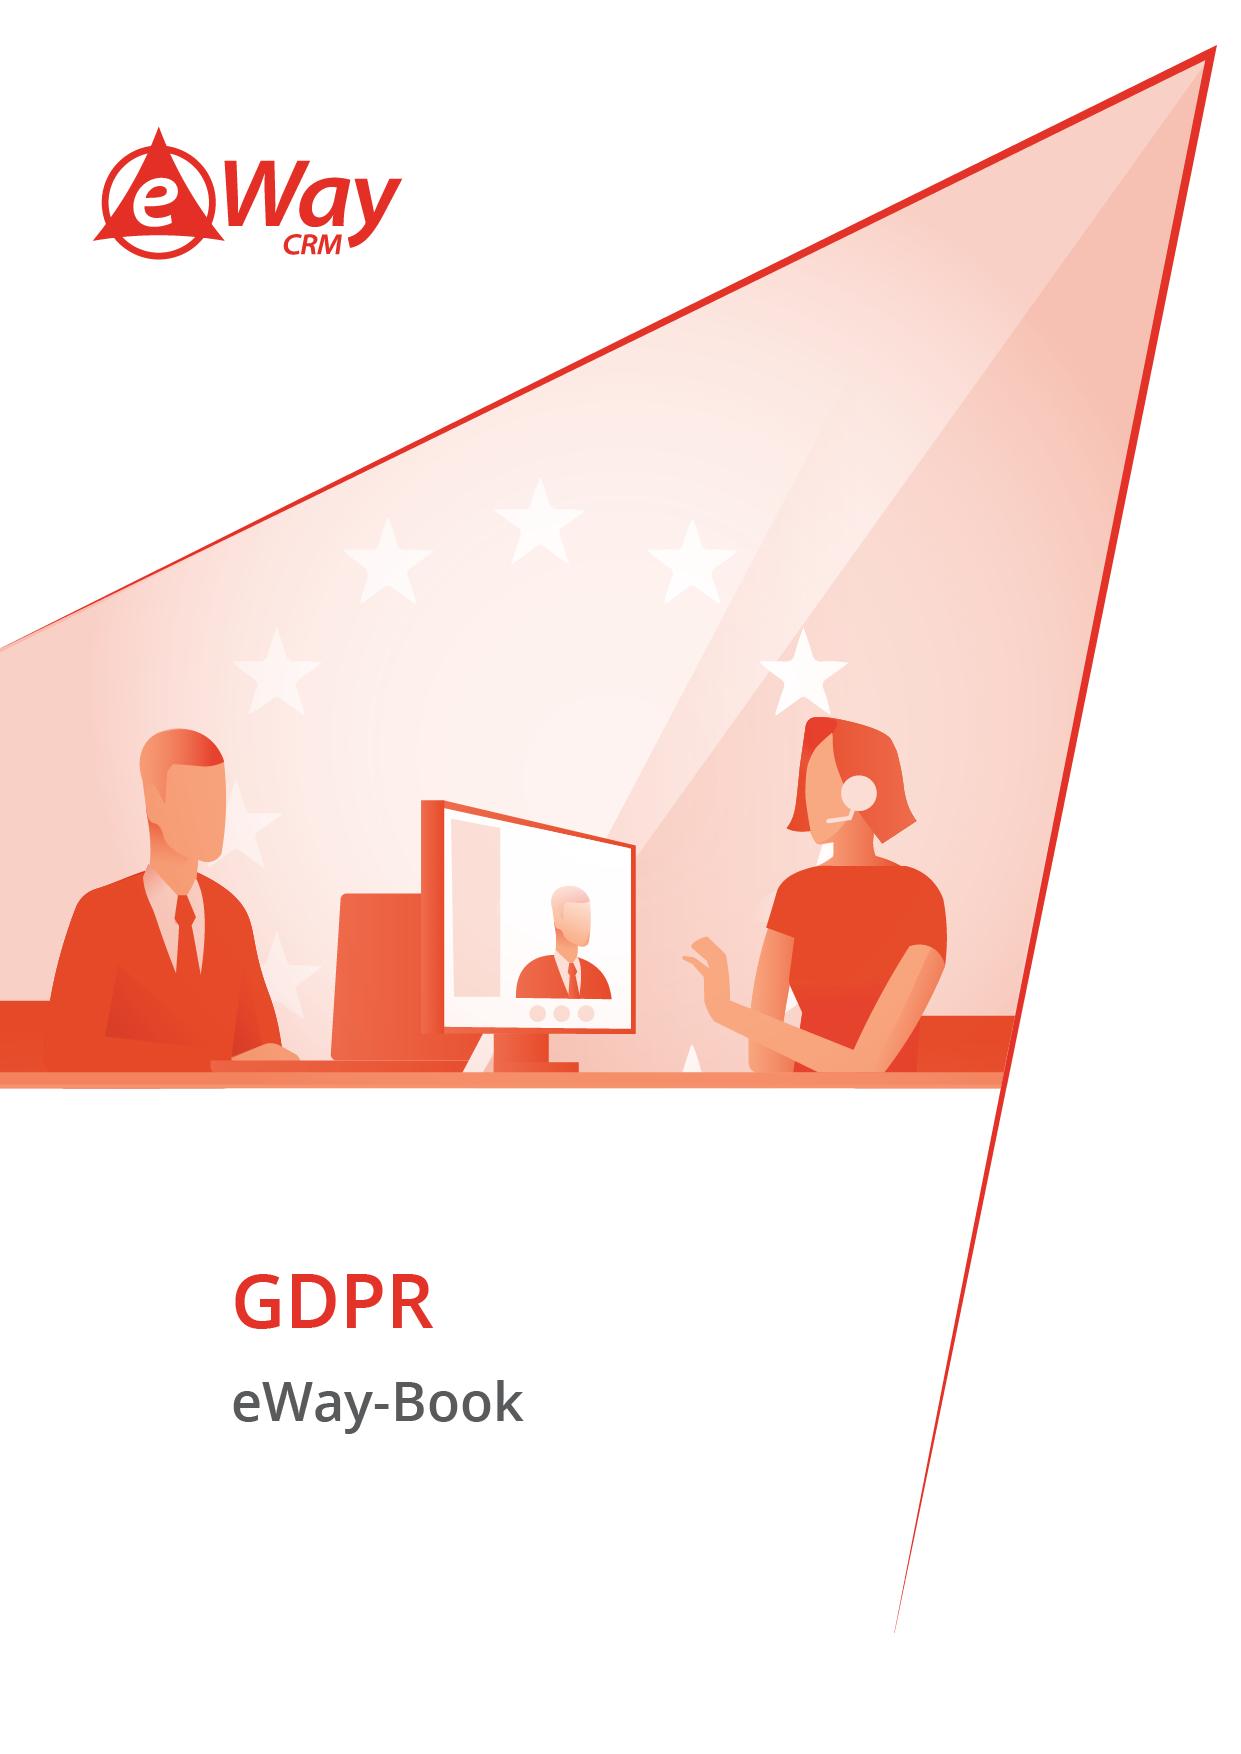 eWay-Book GDPR